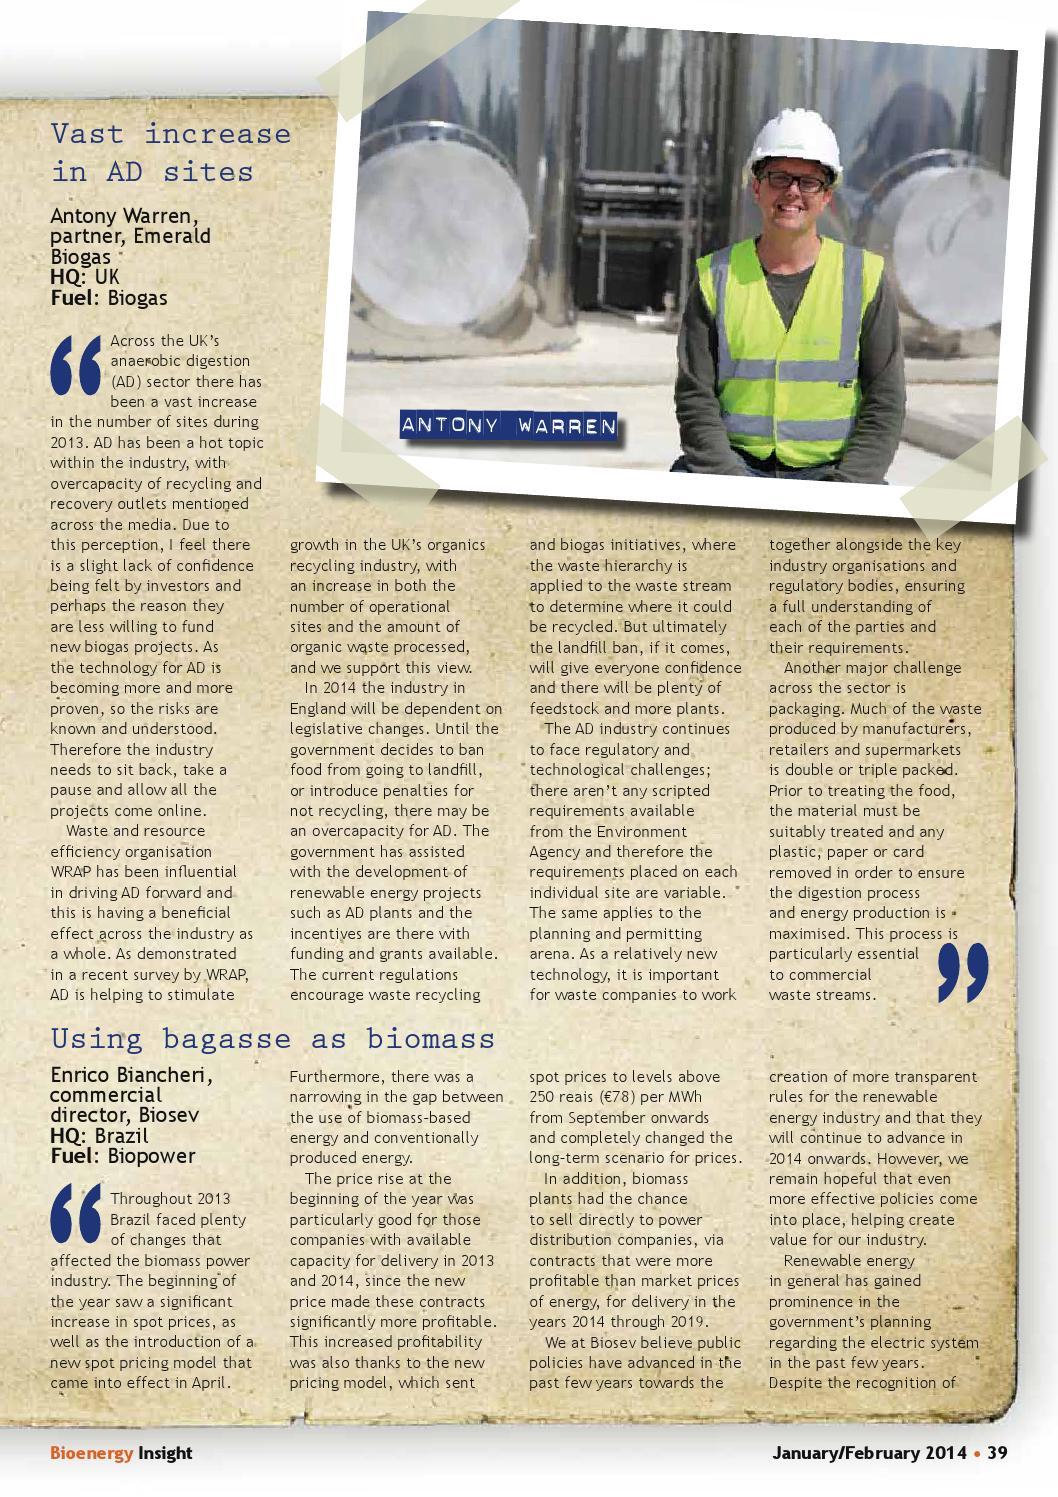 Bioenergy Insight Jan/Feb 2014 by Woodcote Media Ltd - issuu